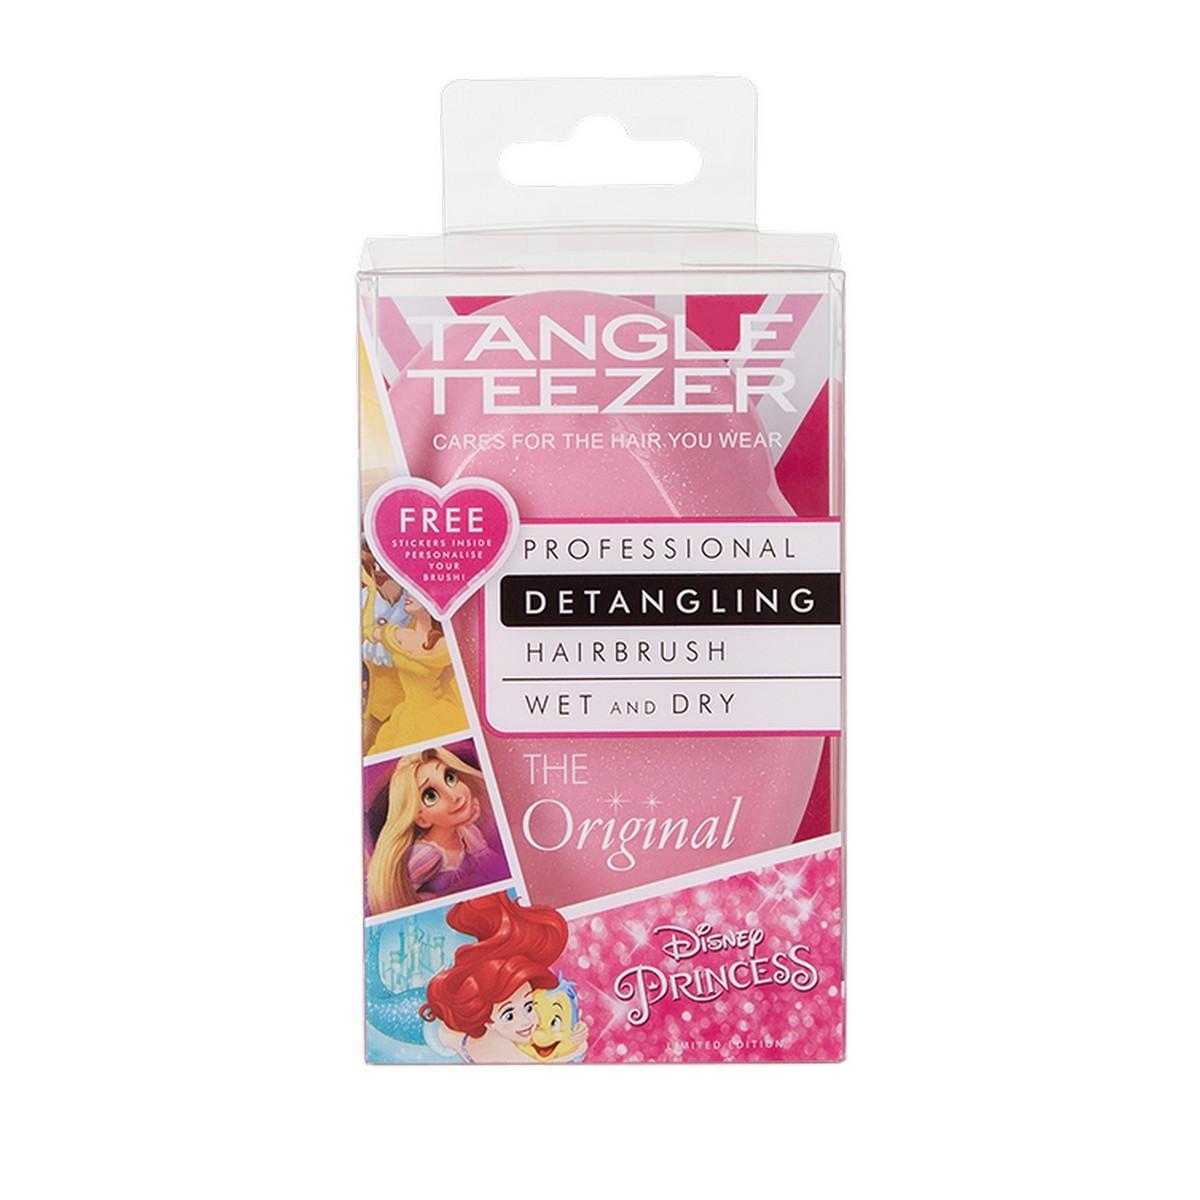 Расческа Tangle Teezer The Original Disney Princess